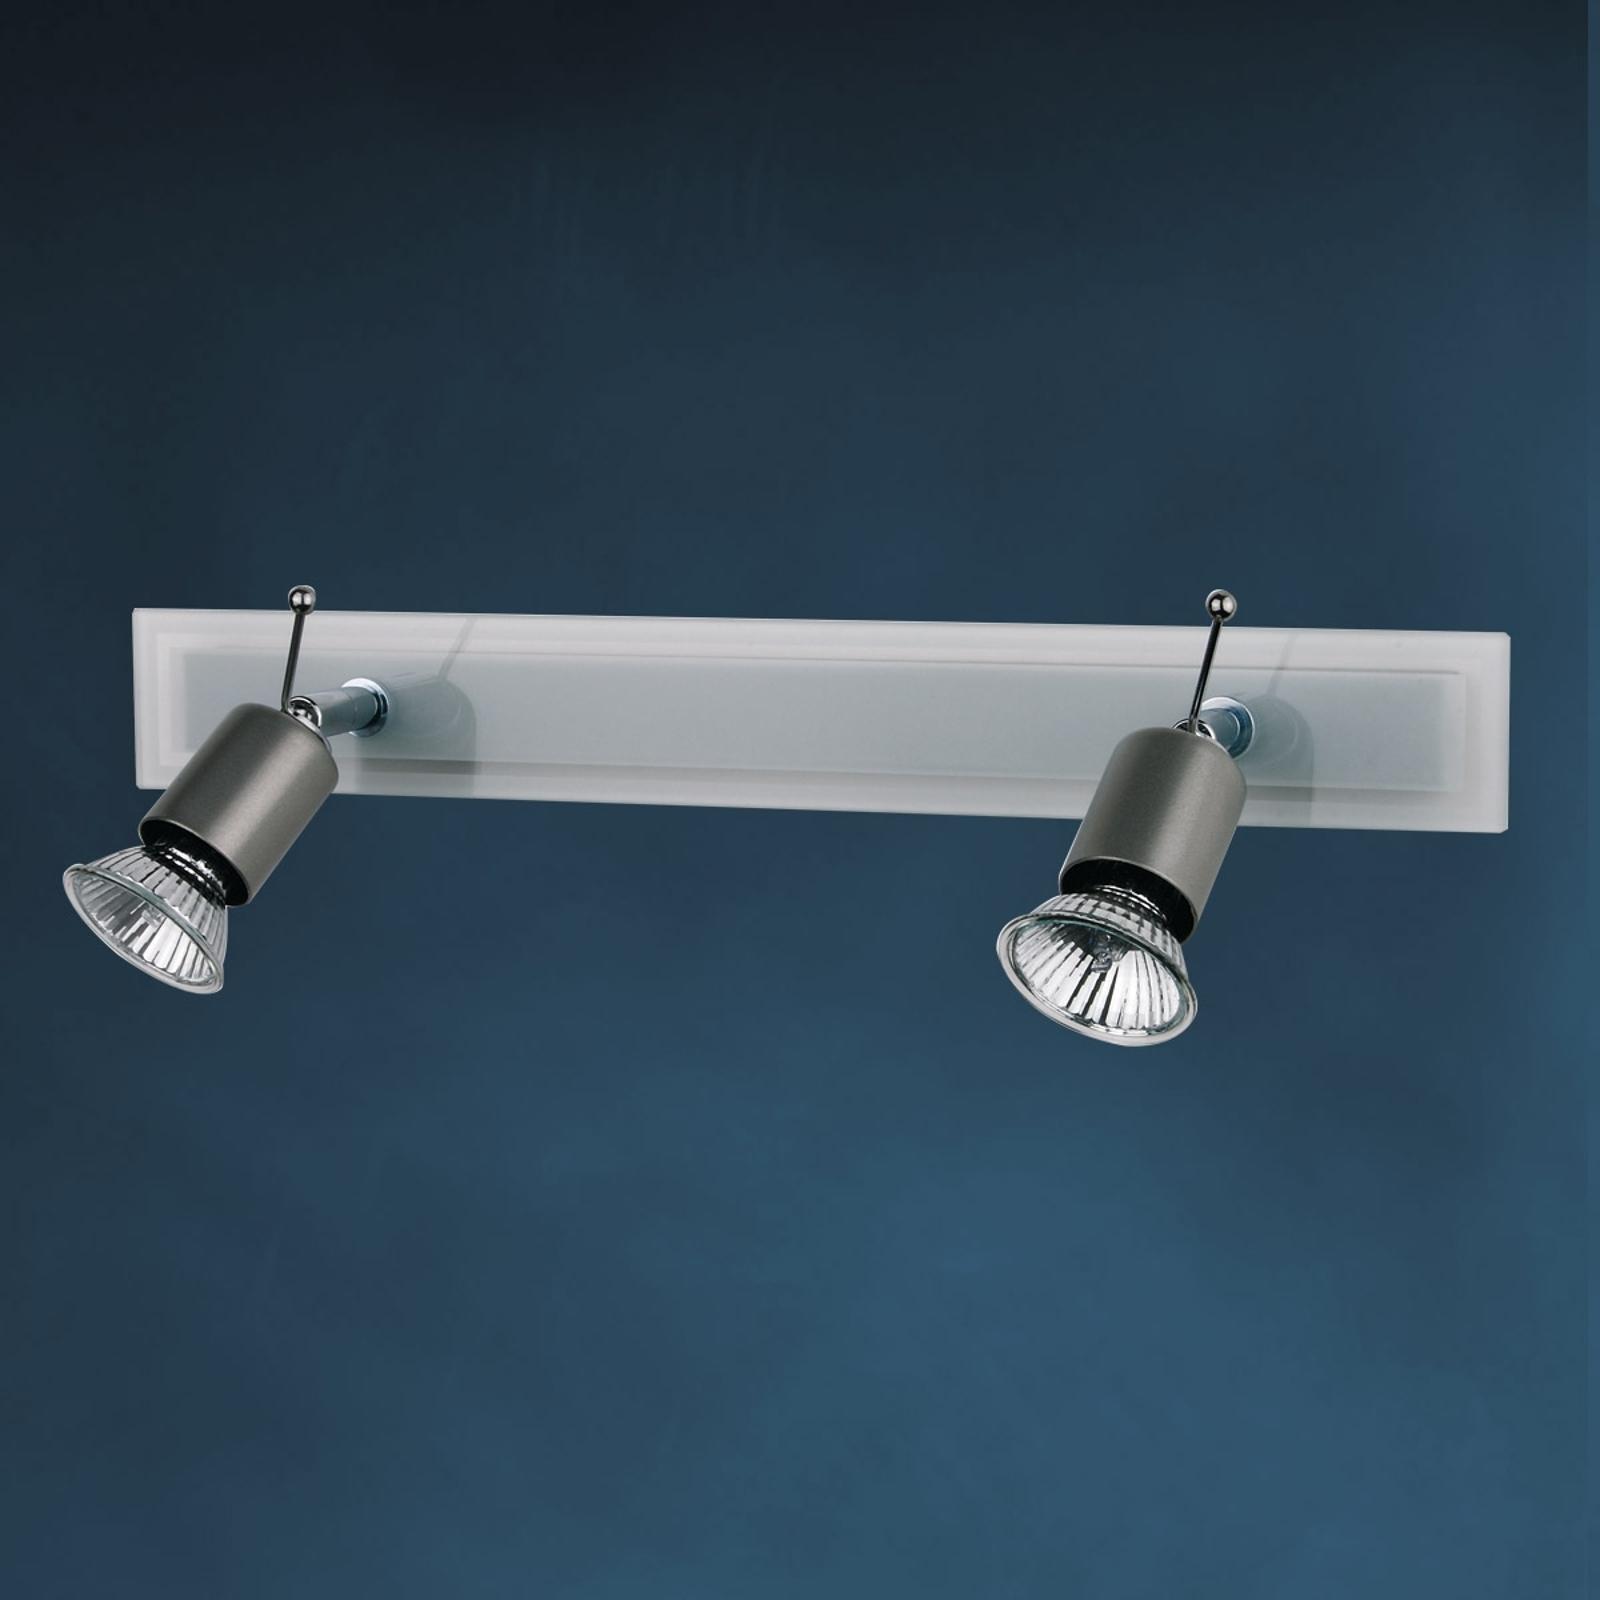 Plafondlamp SARA met glasplaat 2-lichts